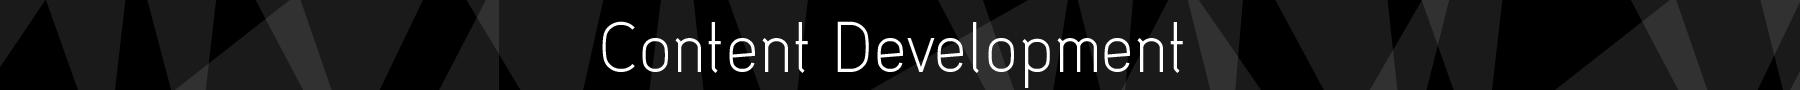 case_study_08_content_development